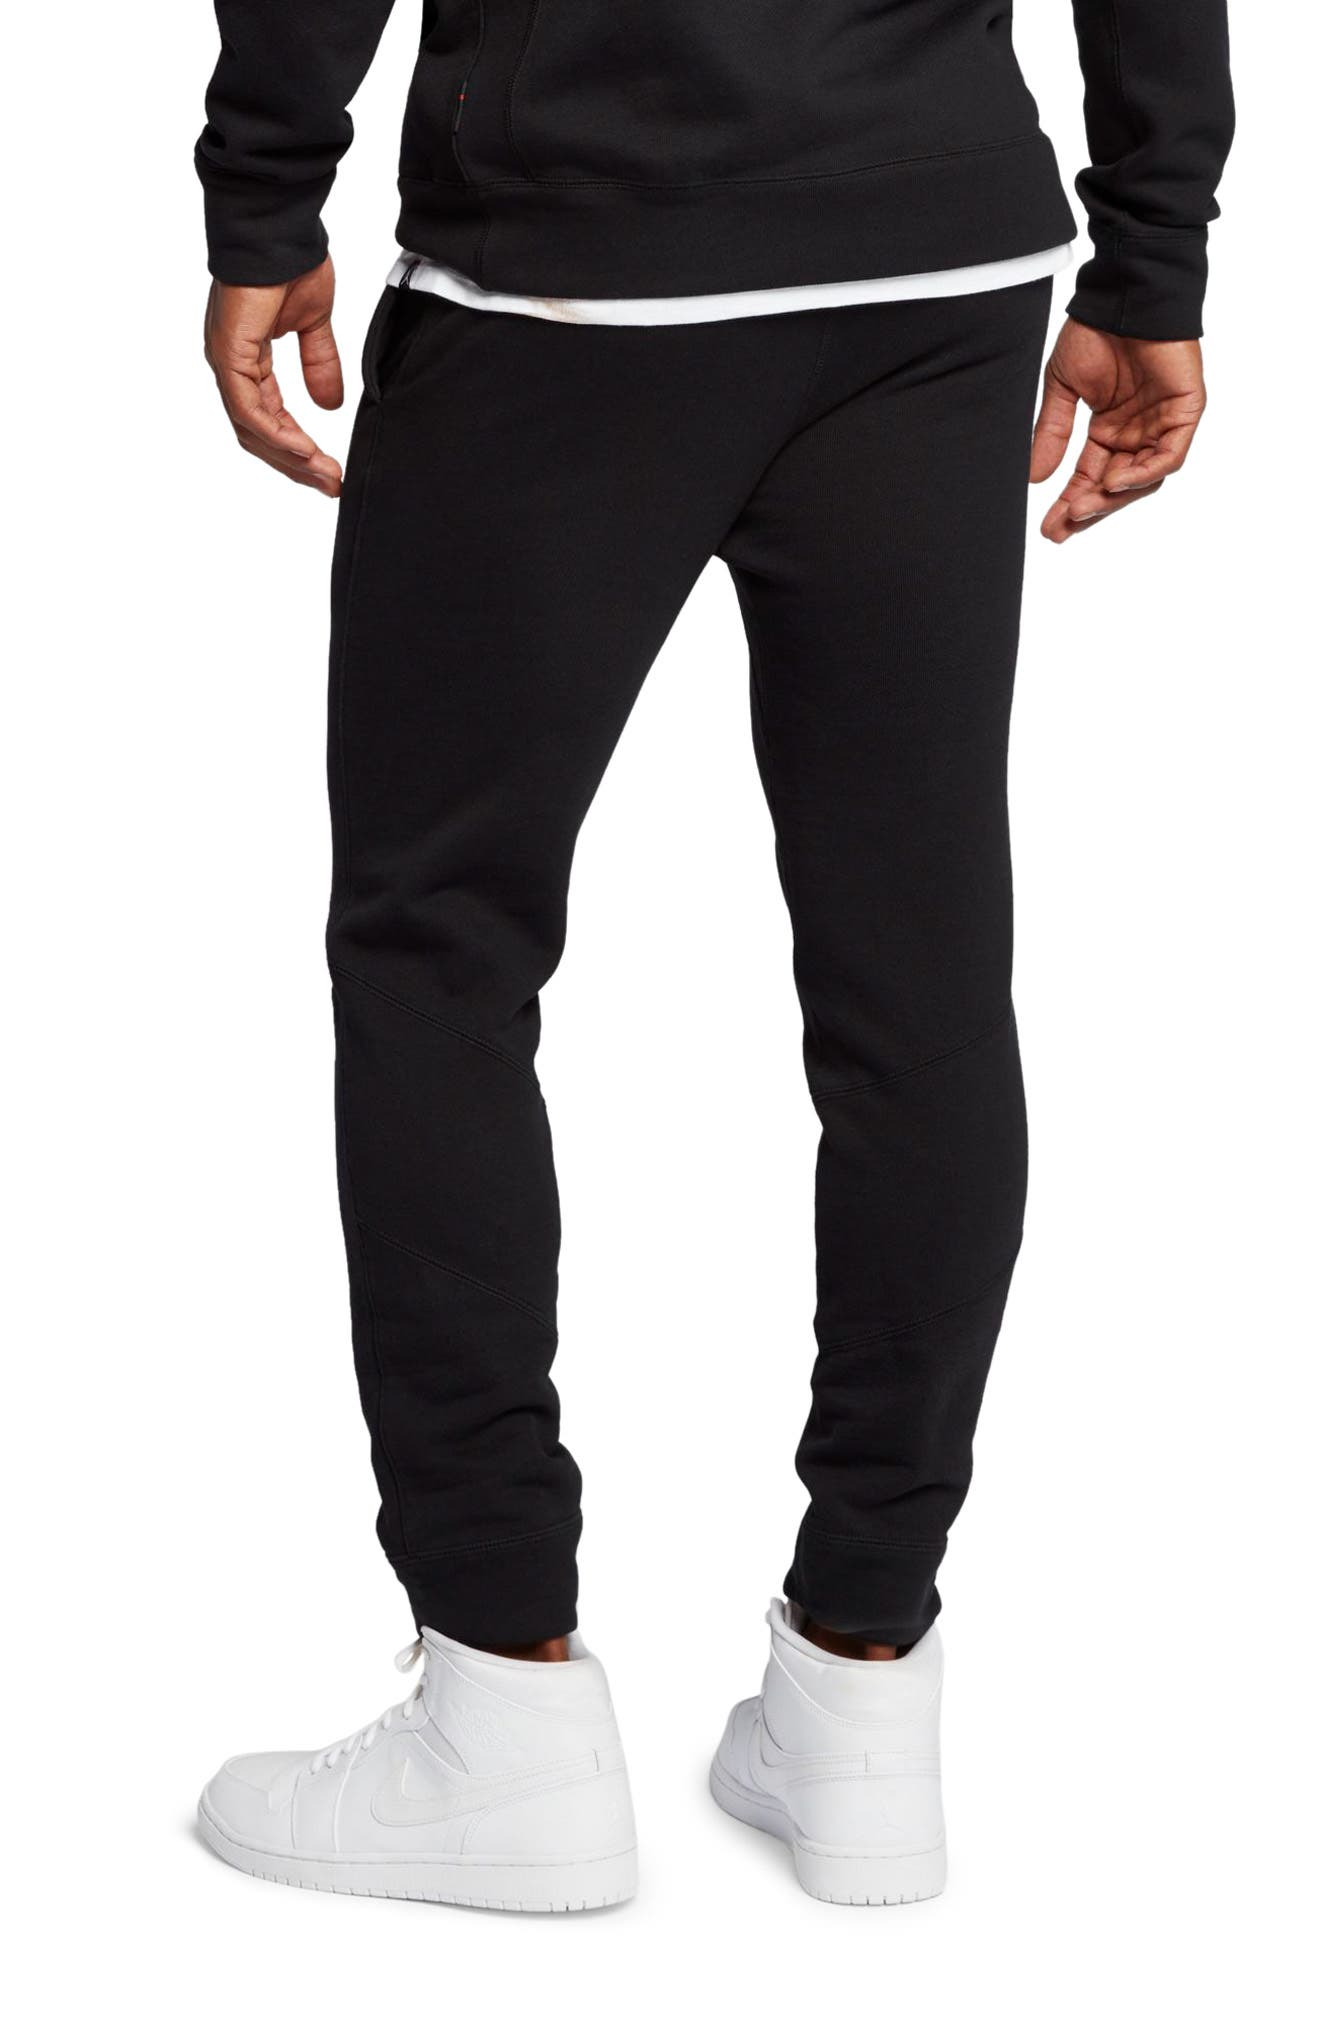 Wings Fleece Pants,                             Alternate thumbnail 2, color,                             Black/ Black